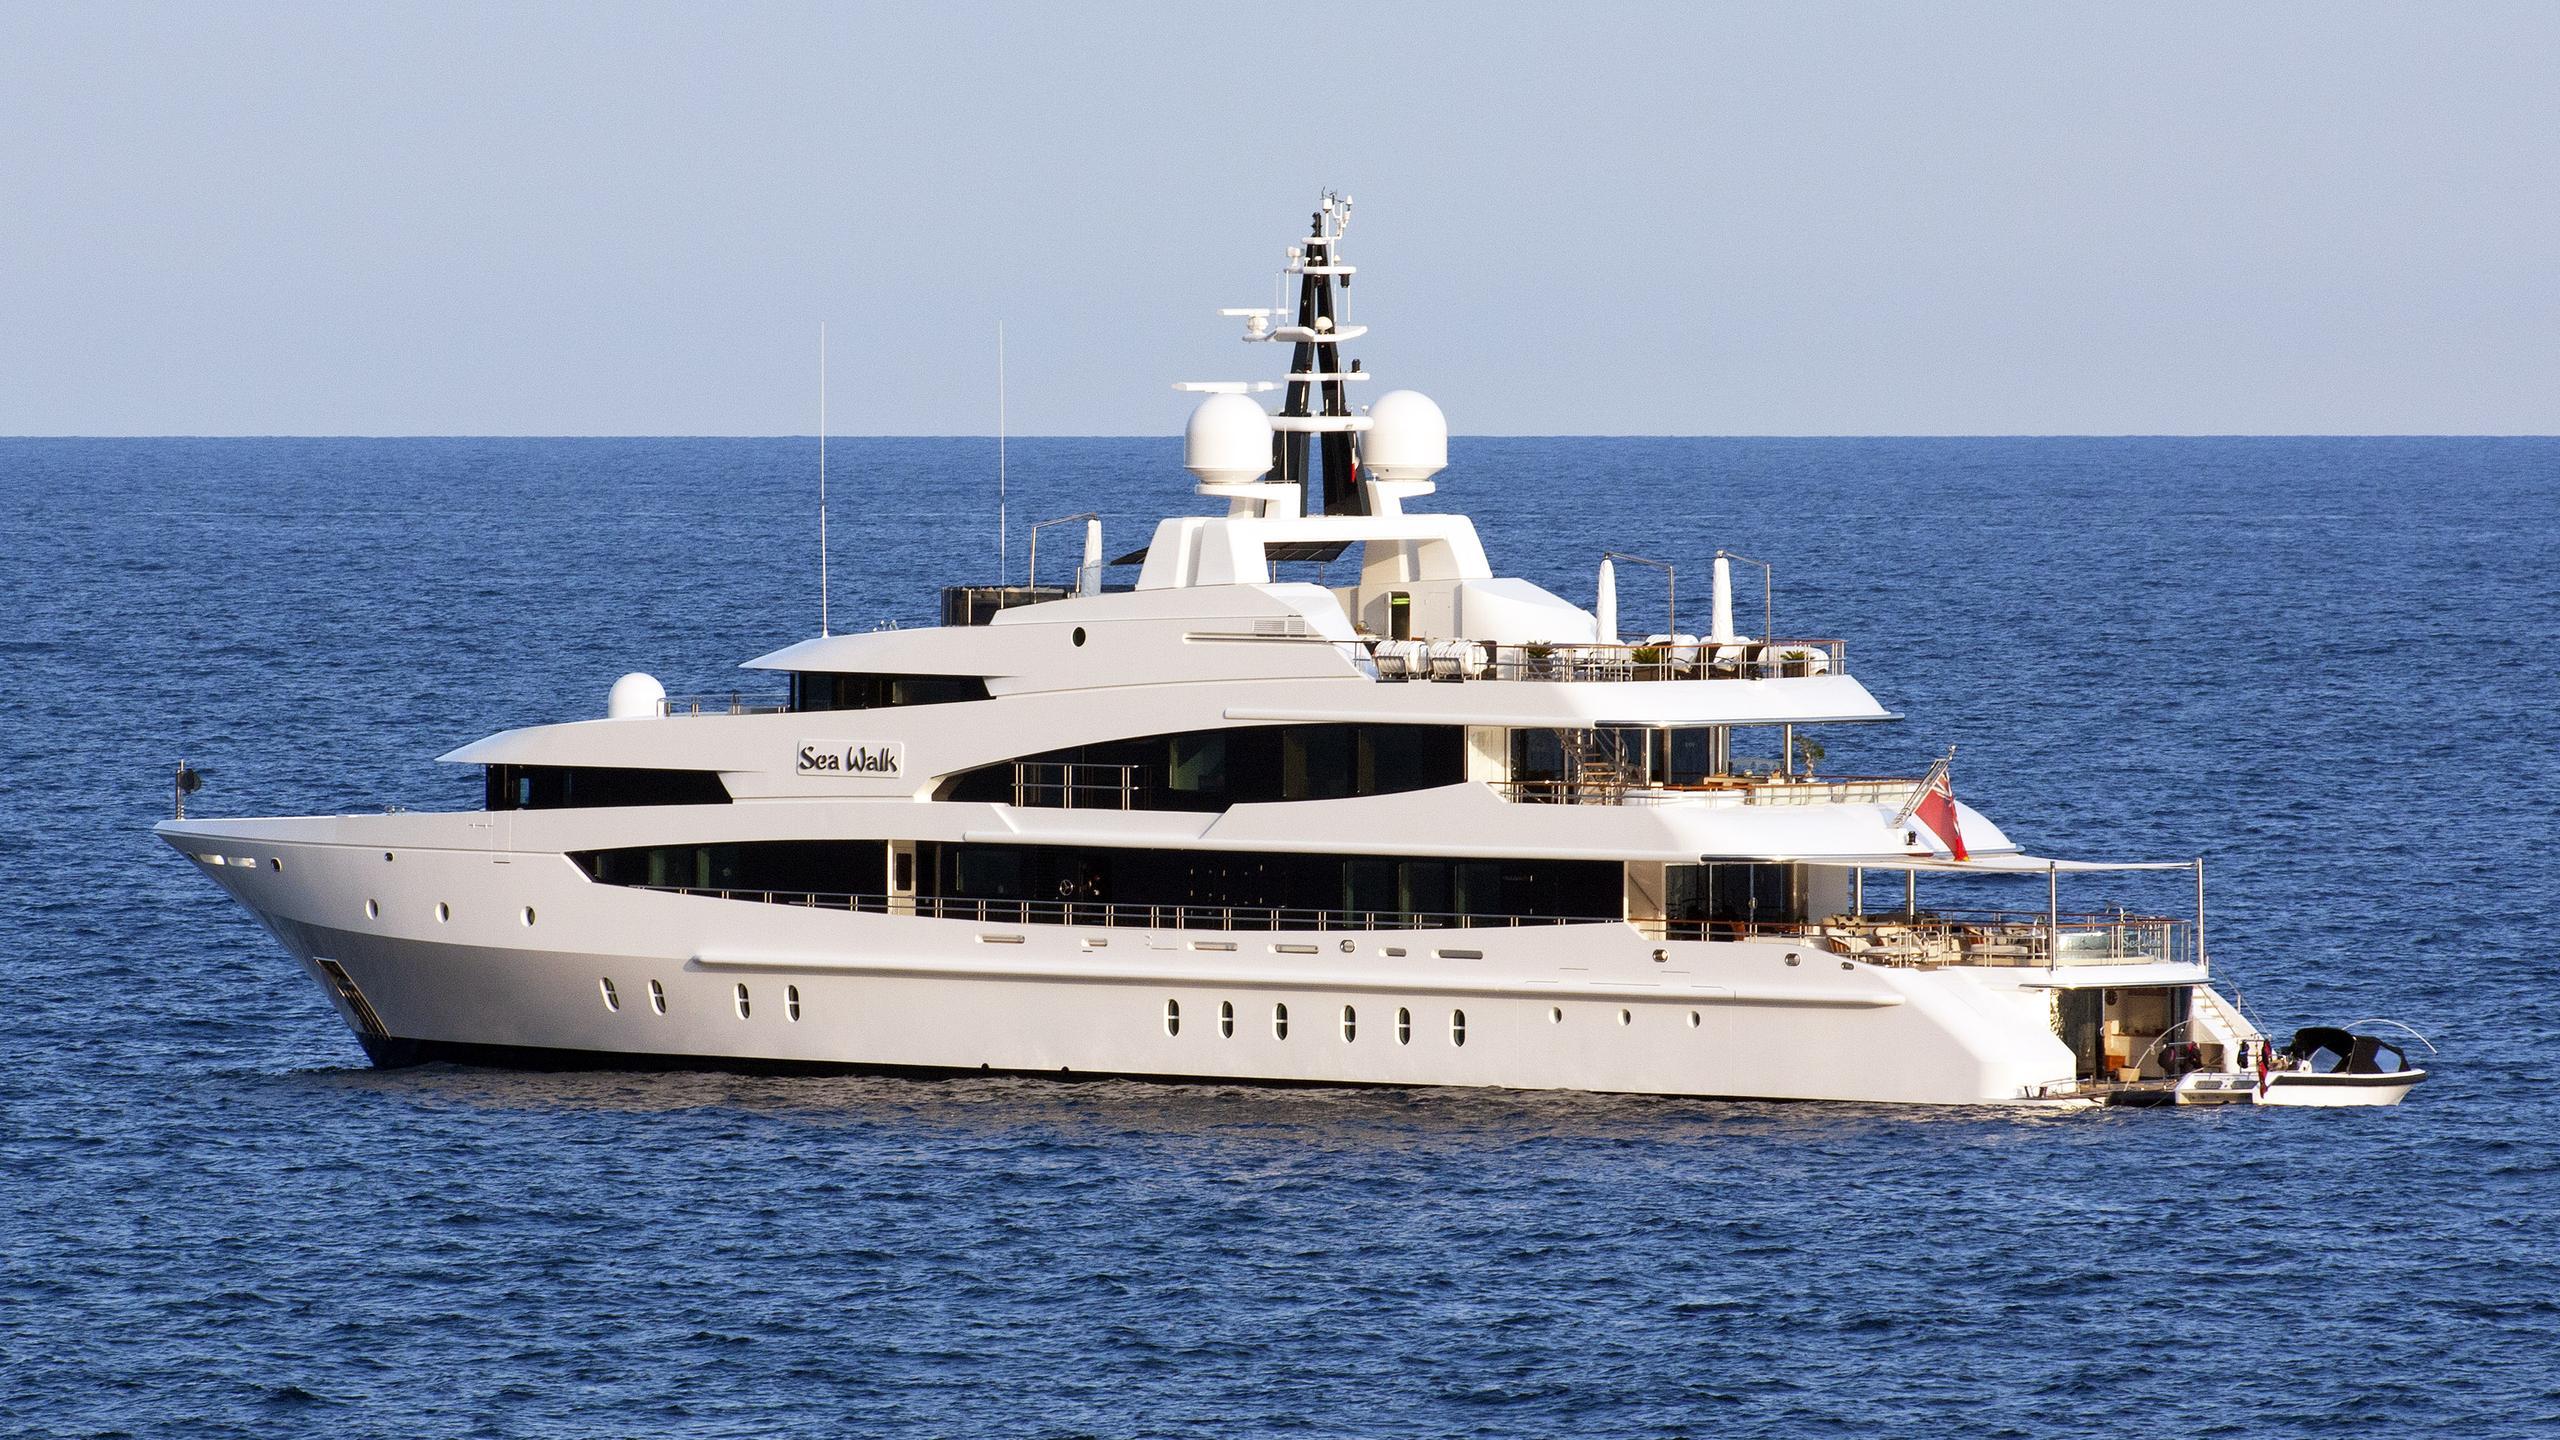 sea-walk-motor-yacht-oceanco-2005-62m-half-profile